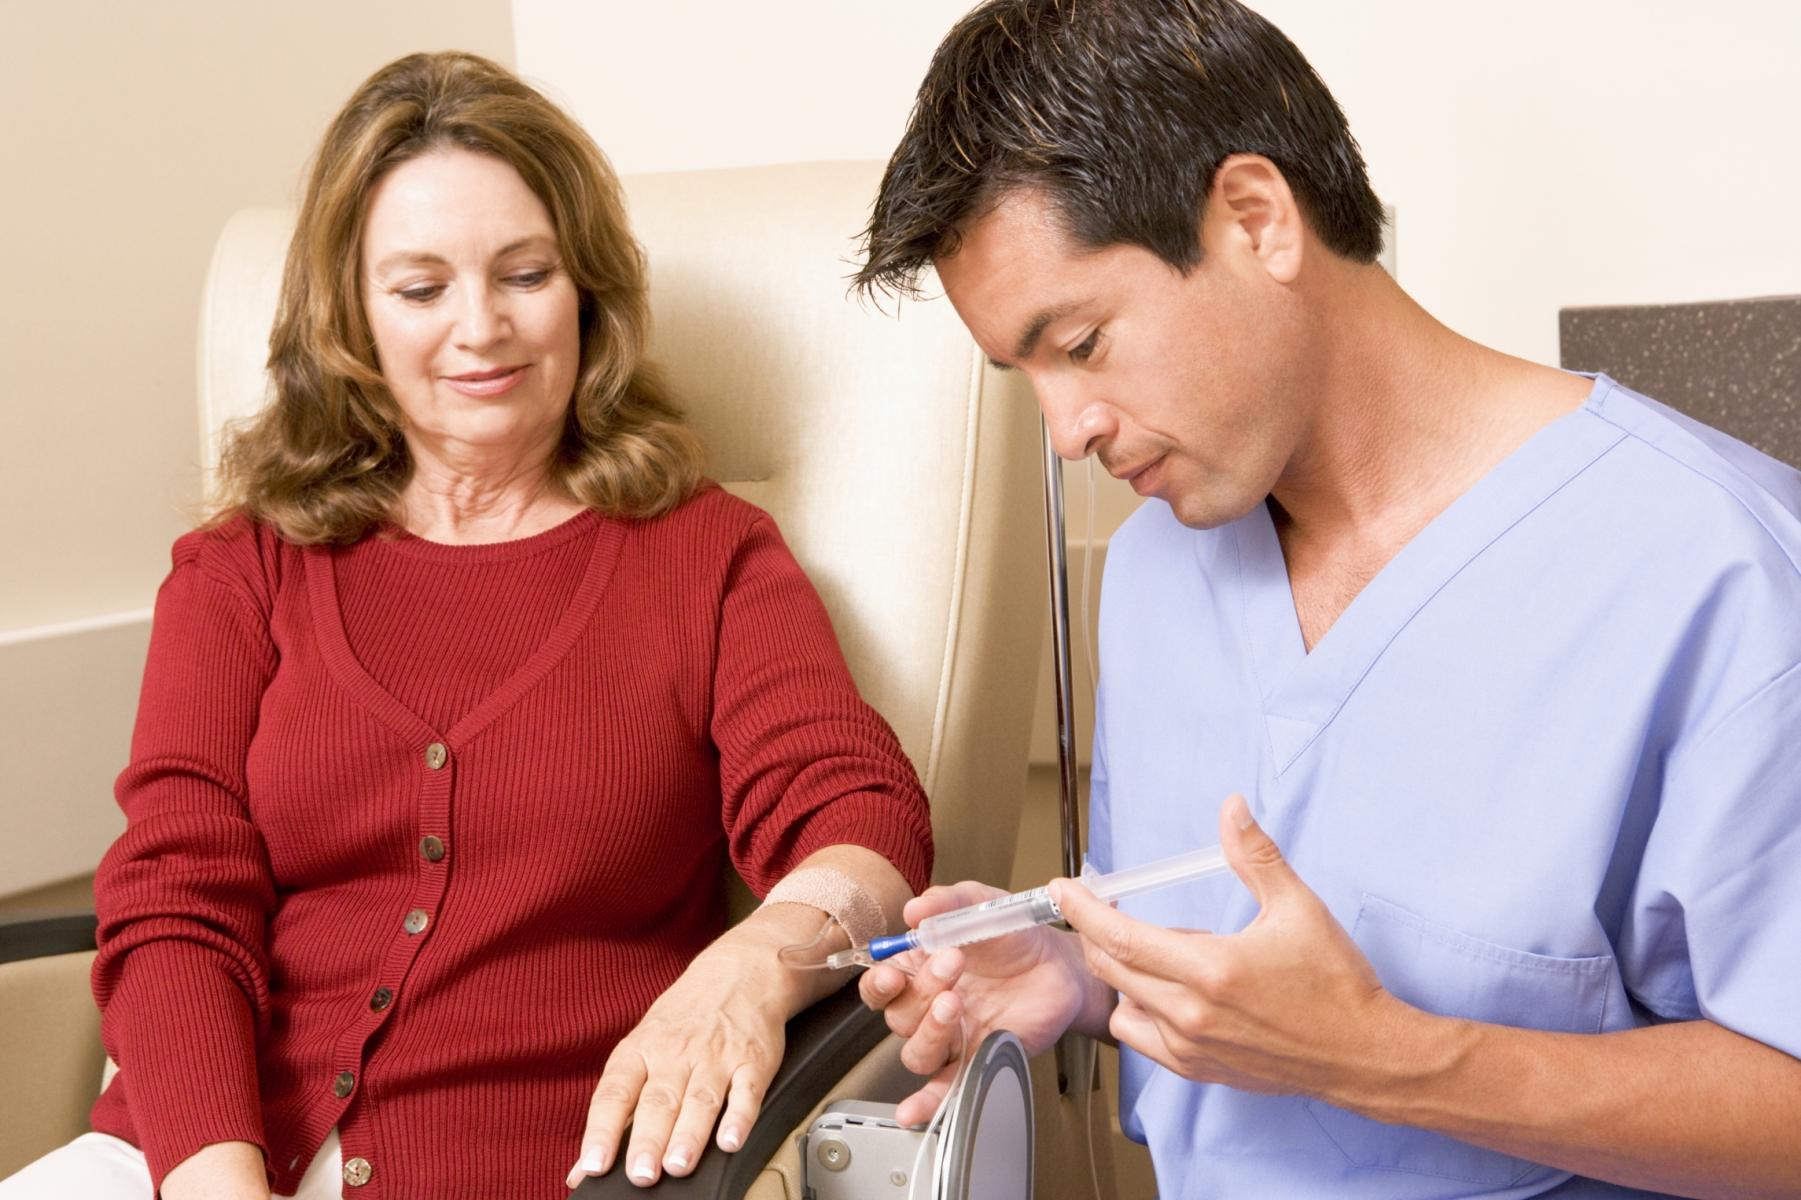 Medico inyecta paciente femenina